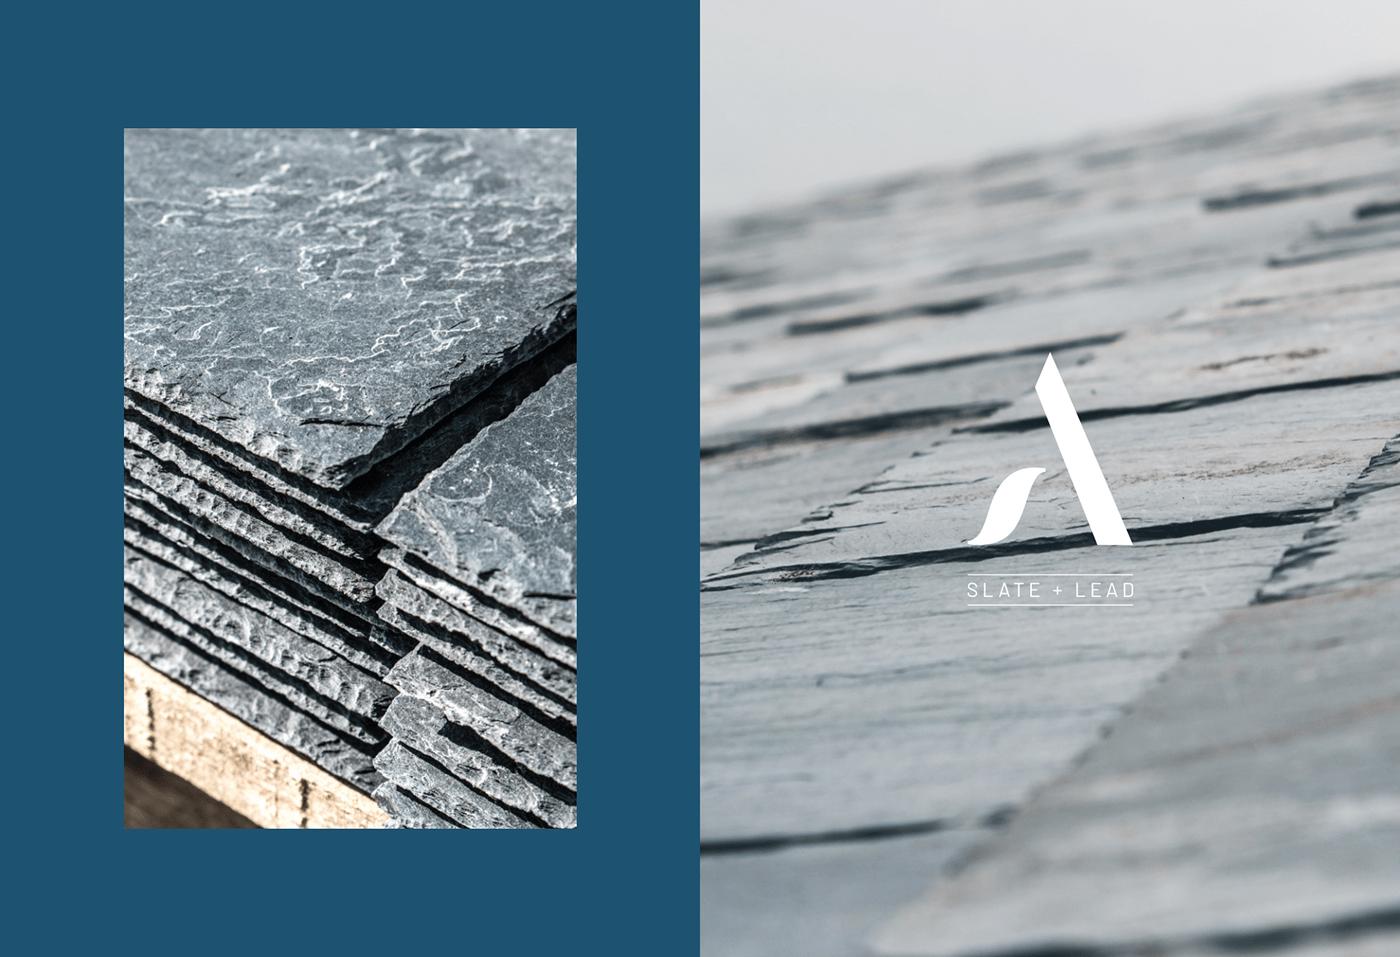 heritage lead Melbourne minimal modern navy blue roofing scottish slate traditional